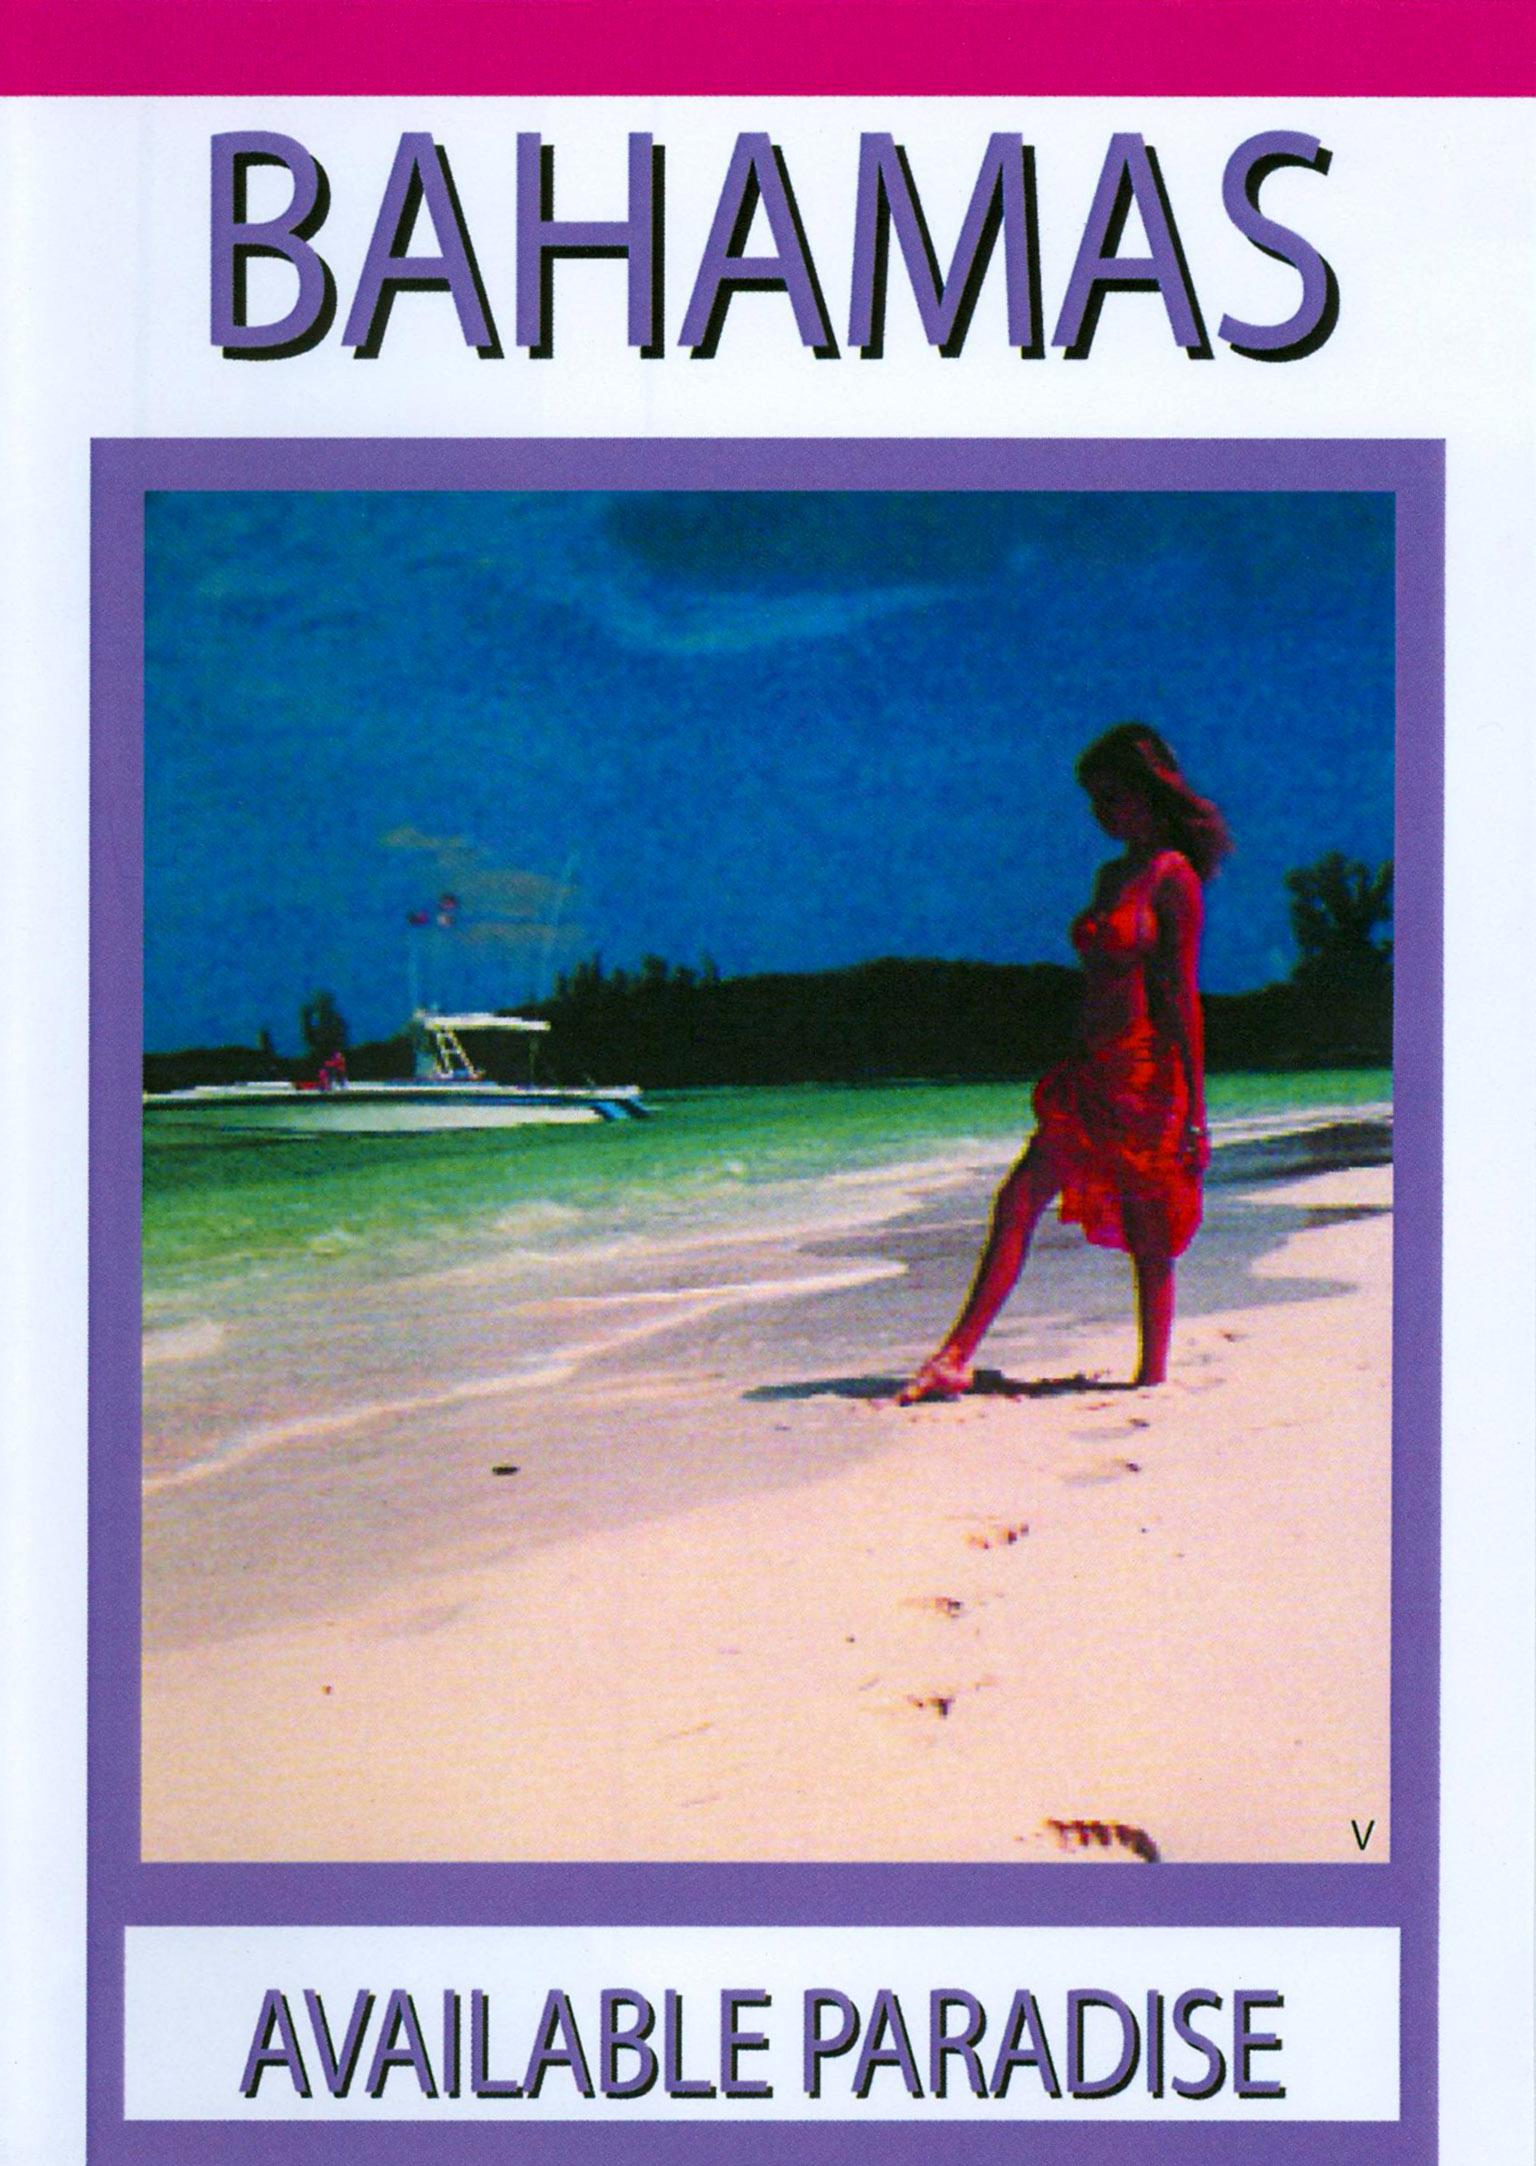 The Bahamas: The Available Paradise